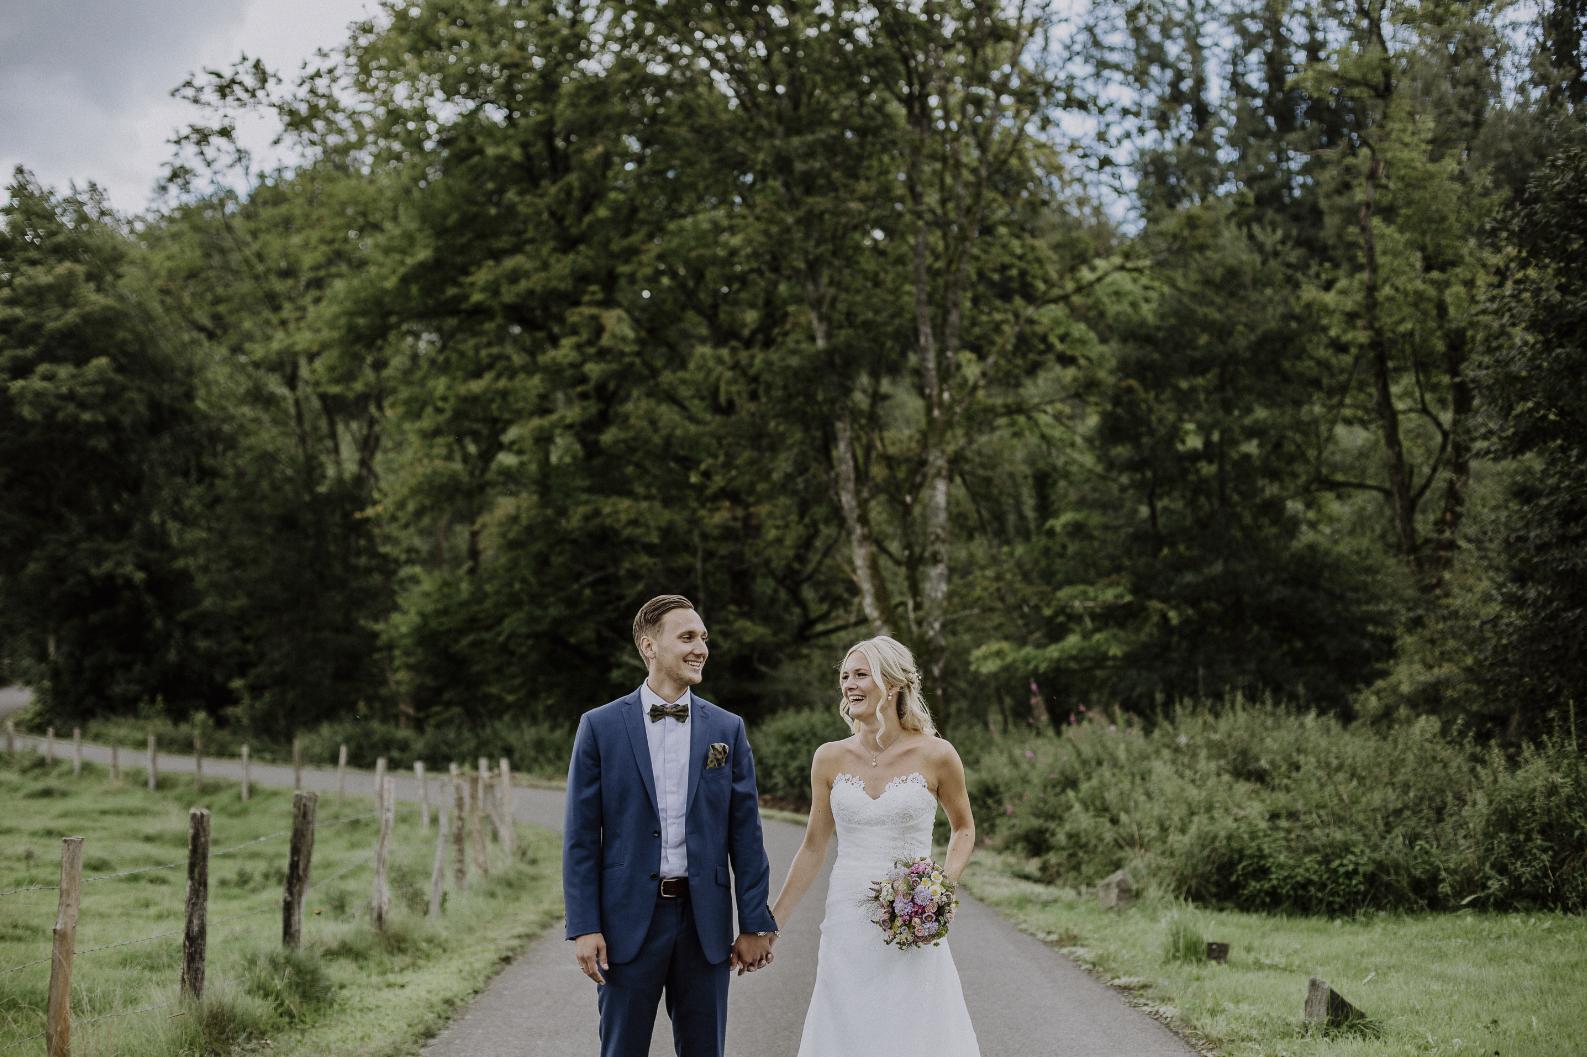 Wedding couple weddingday weddingdress bridetobe